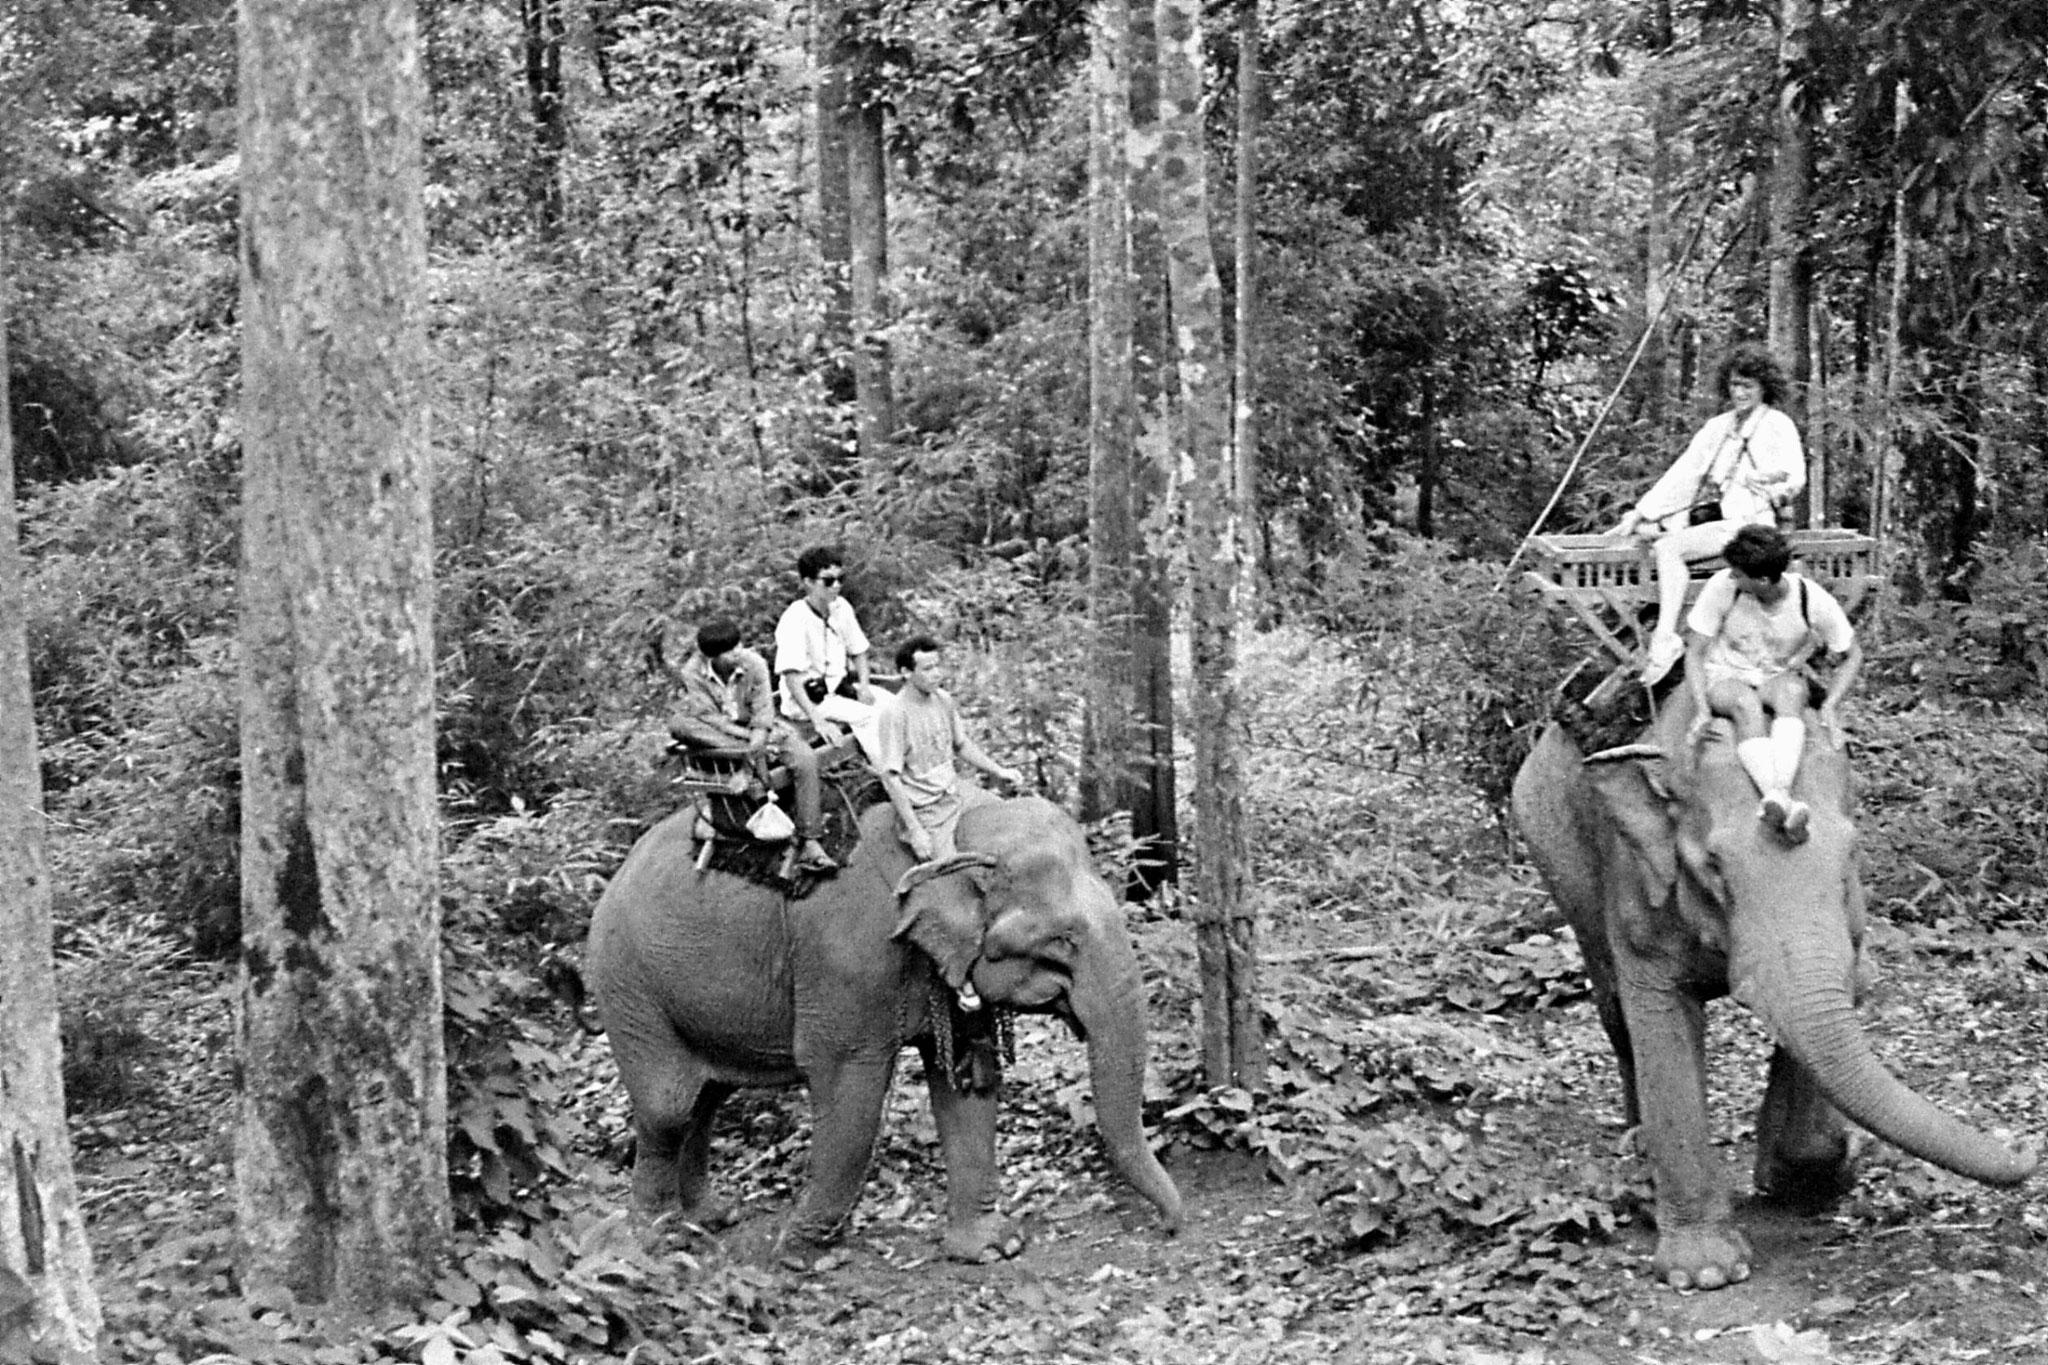 13/6/1990: 26: Last day of Trek, on elephant